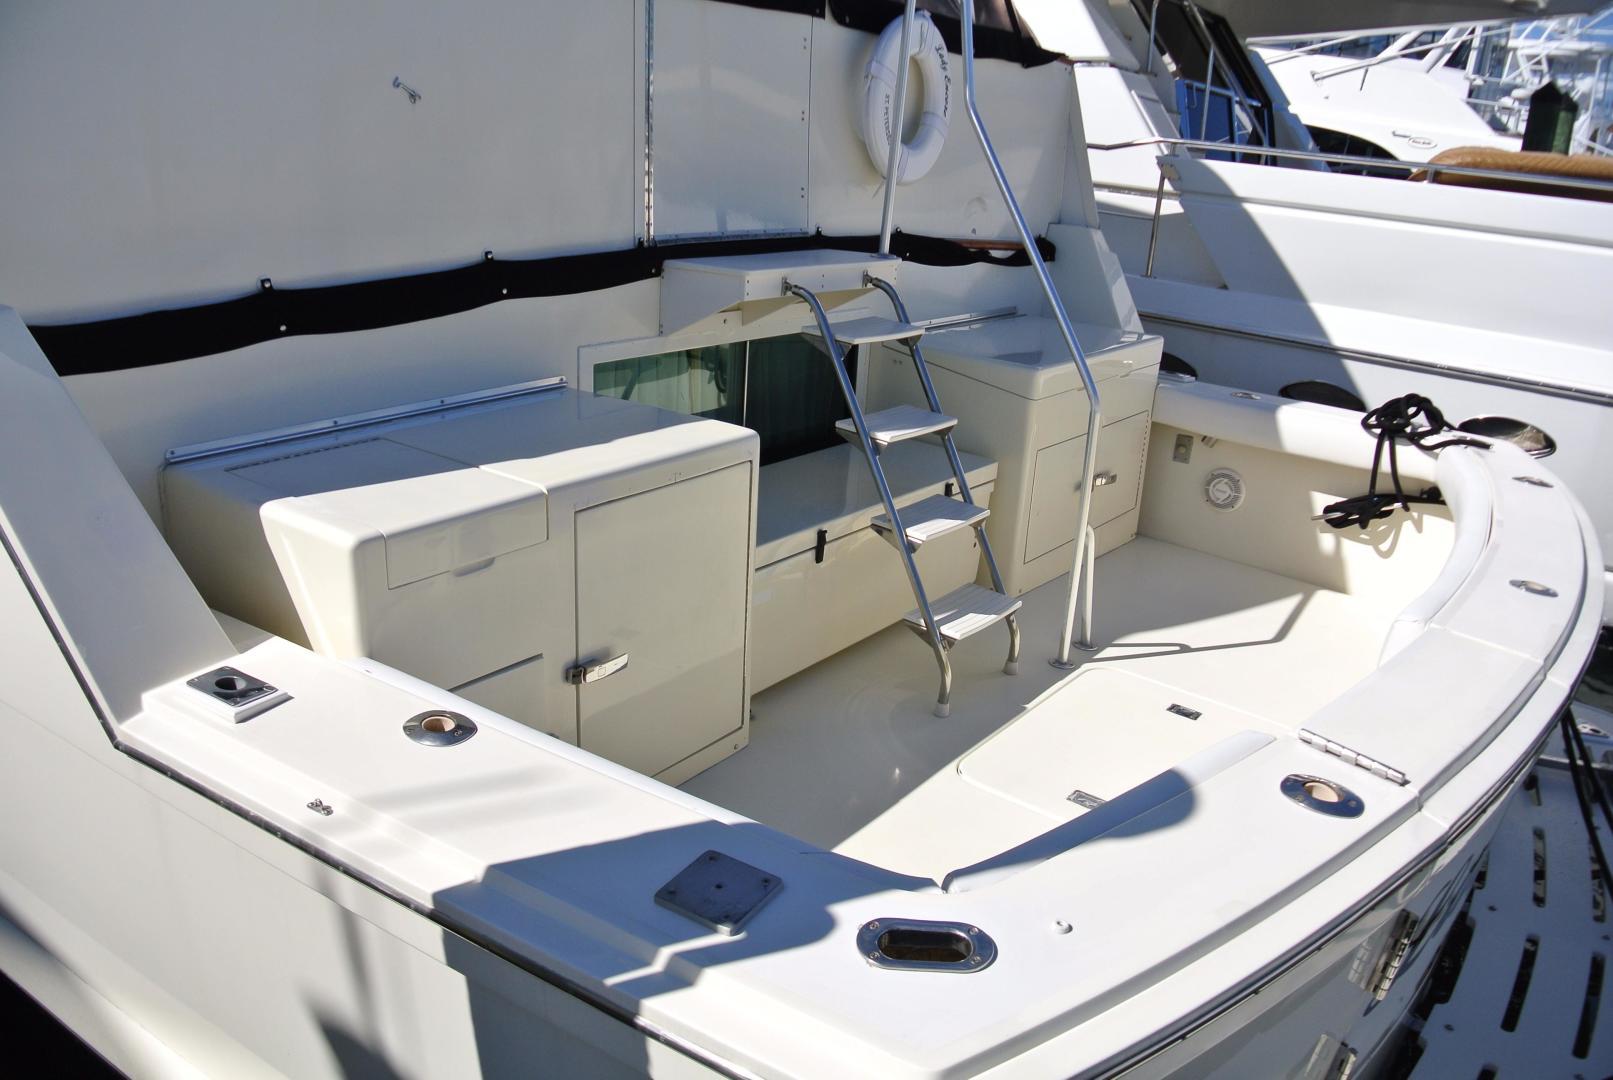 Hatteras-67-Cockpit-Motor-Yacht-1988-Lady-Encore-Saint-Petersburg-Florida-United-States-Cockpit-926172